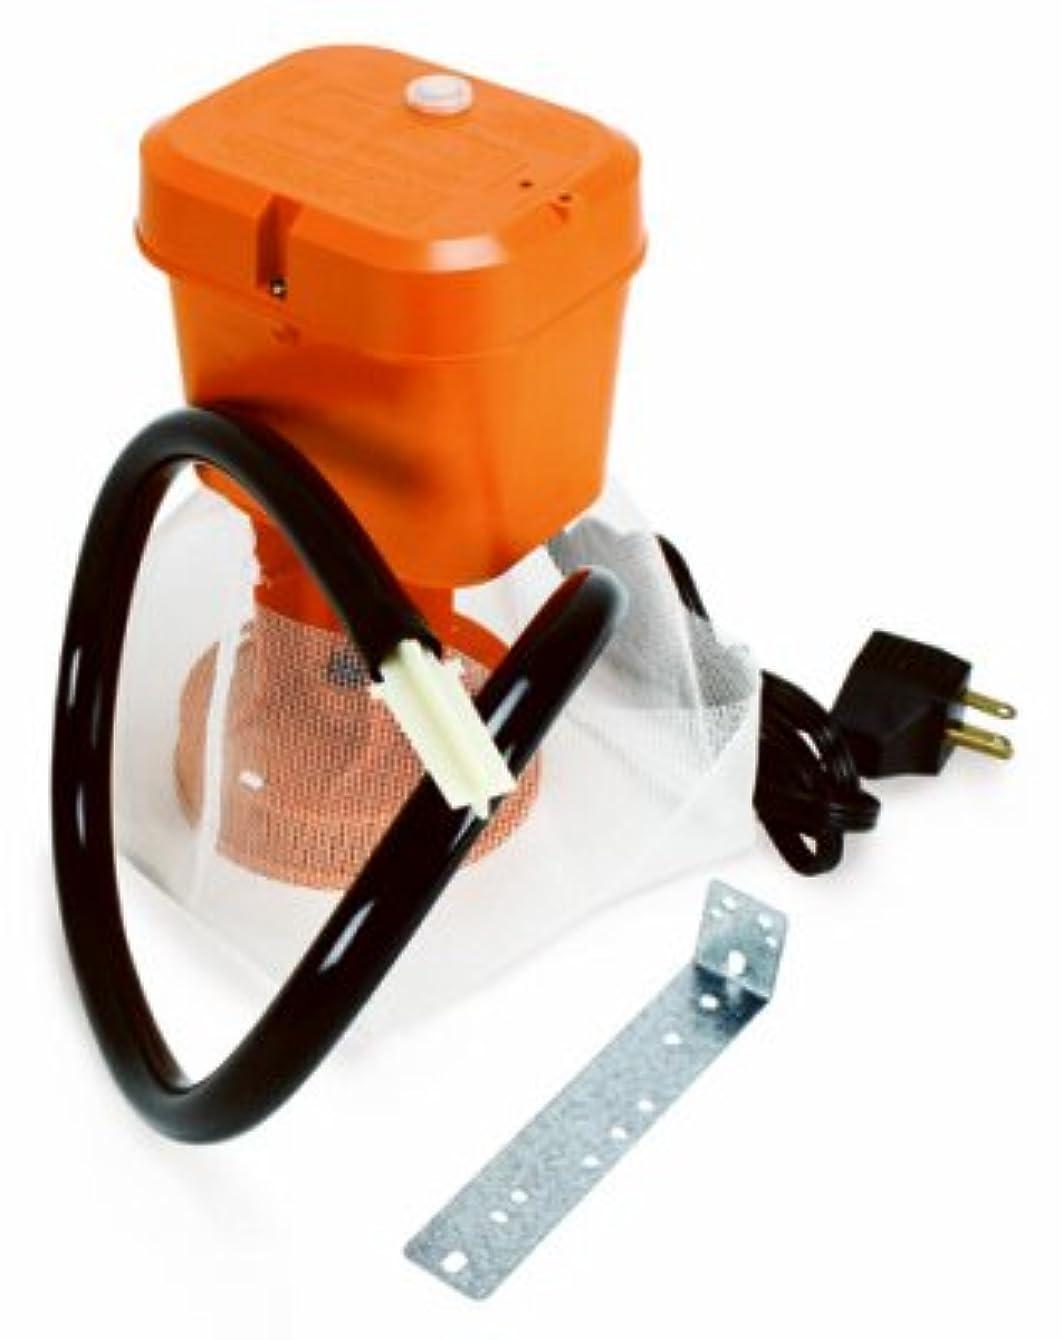 Dial Evaporative Cooler Purge Pump, Model 1541